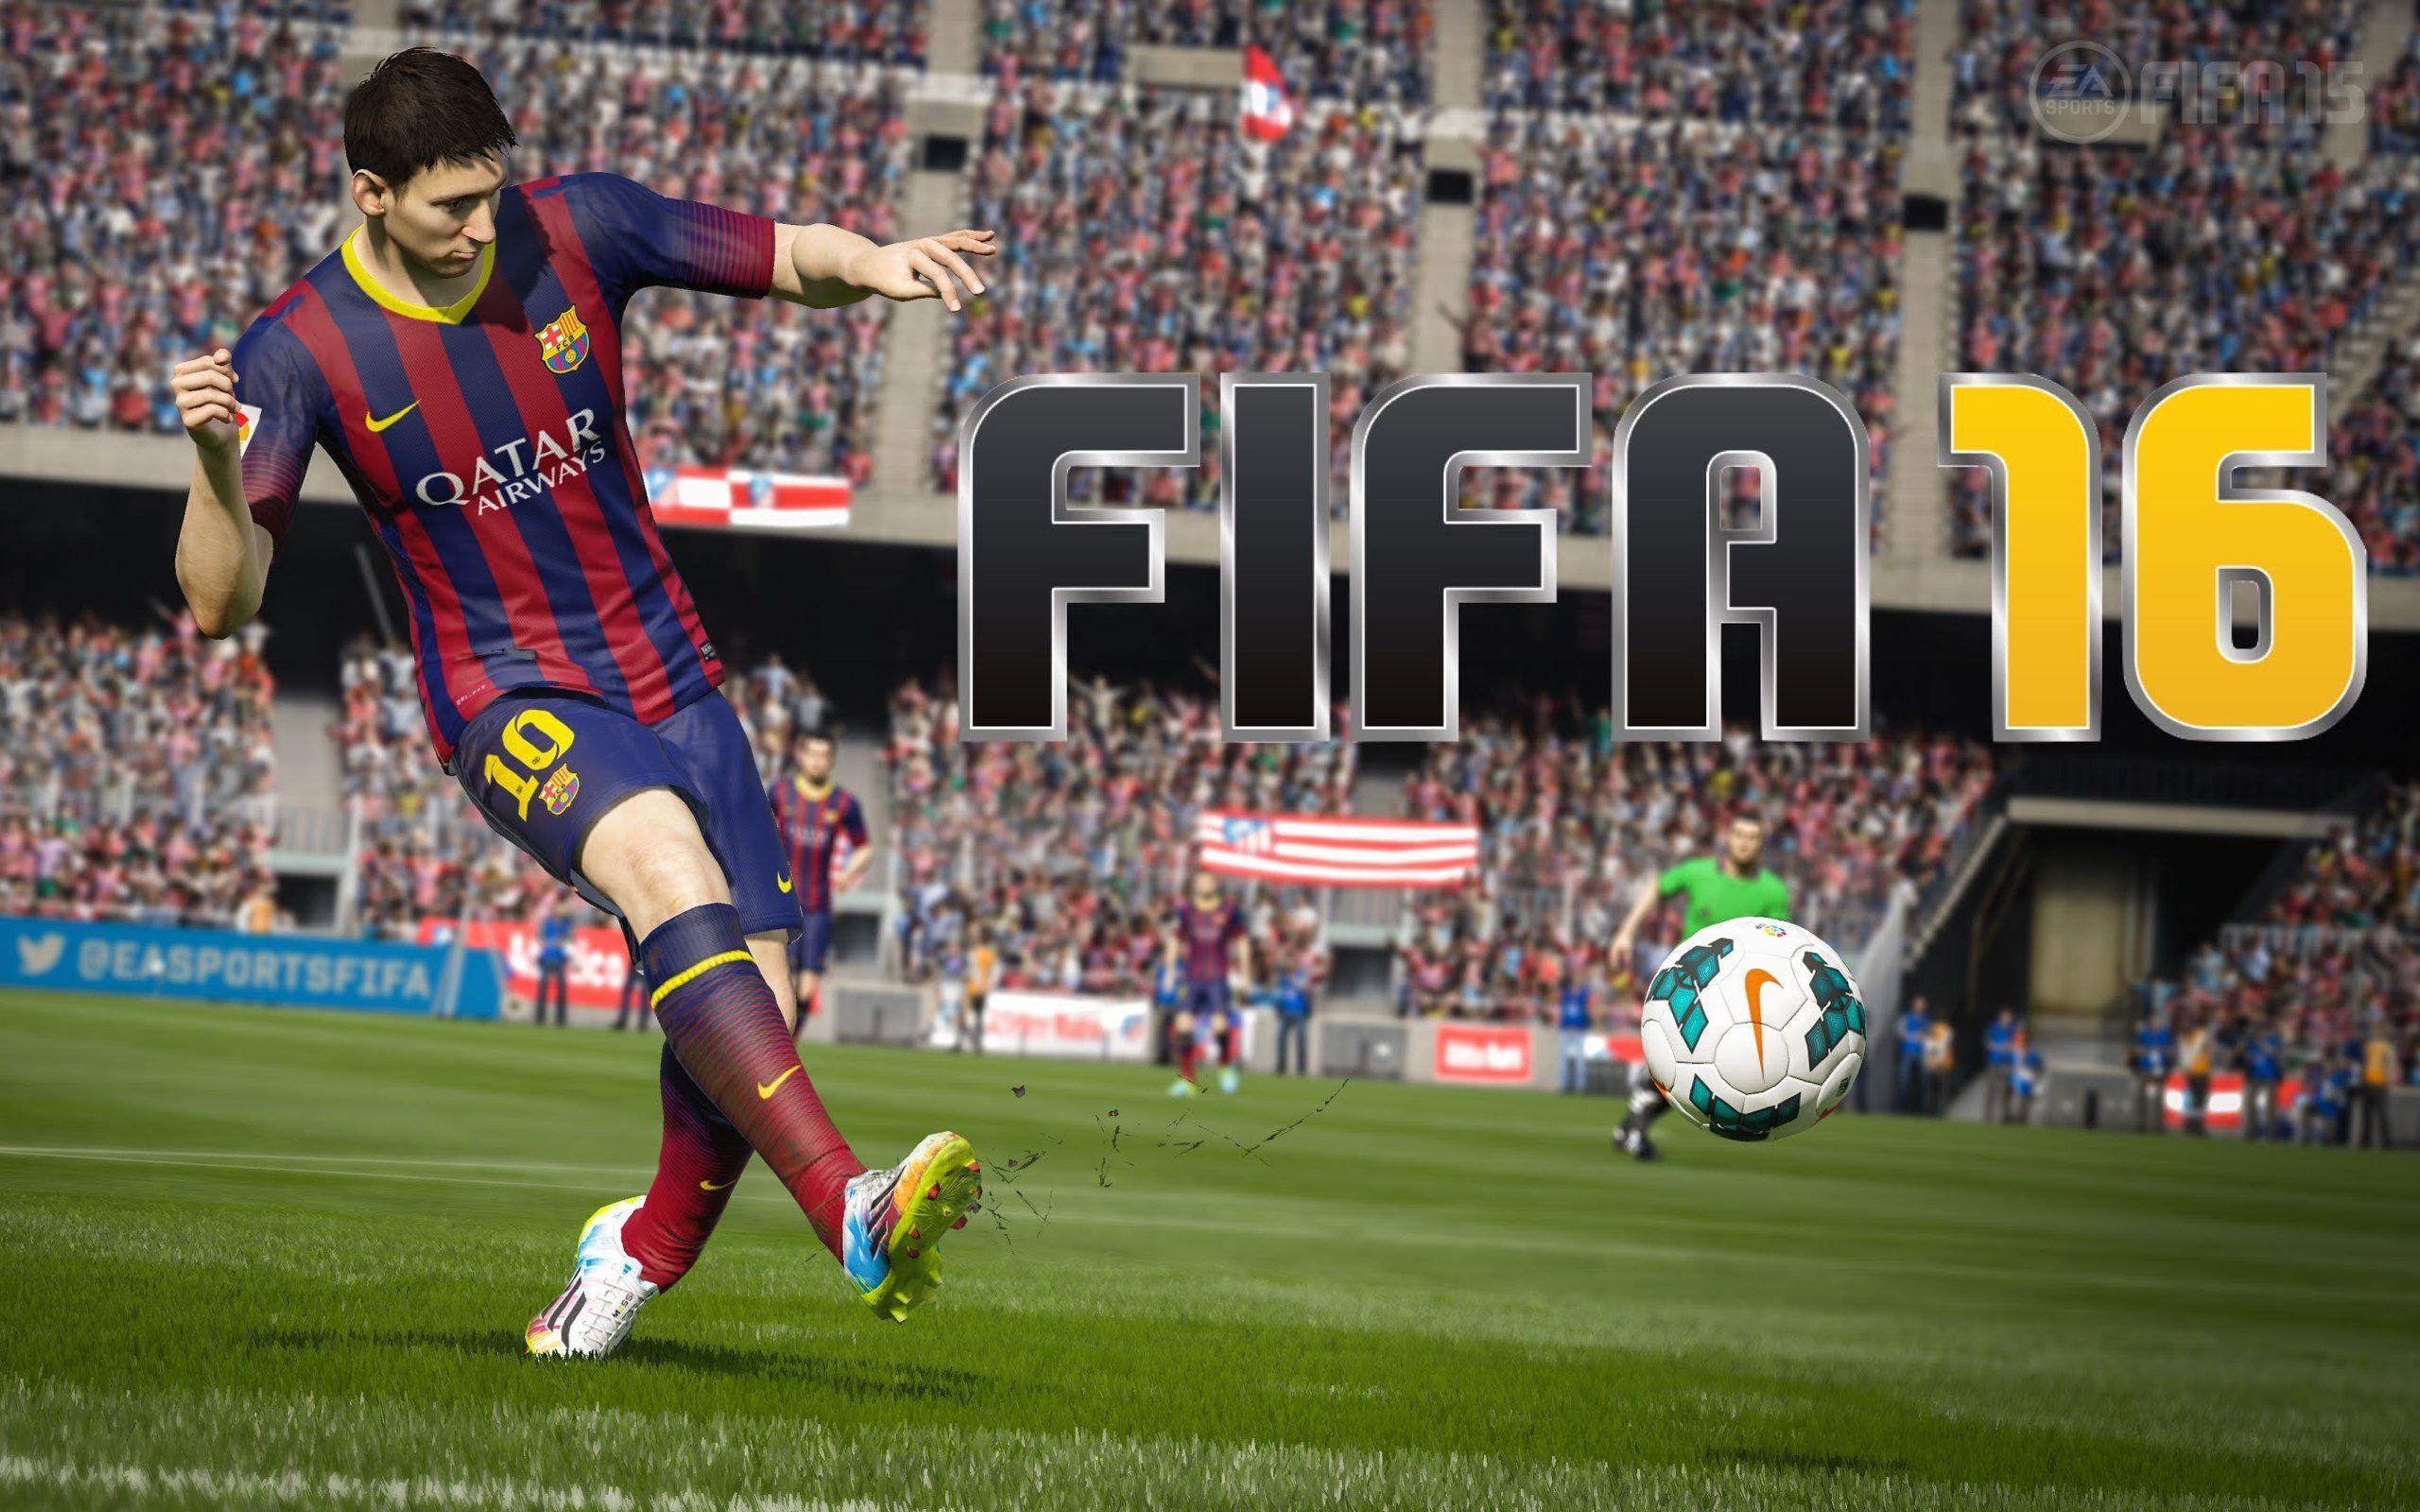 Fifa 16 HD Wallpapers 4K